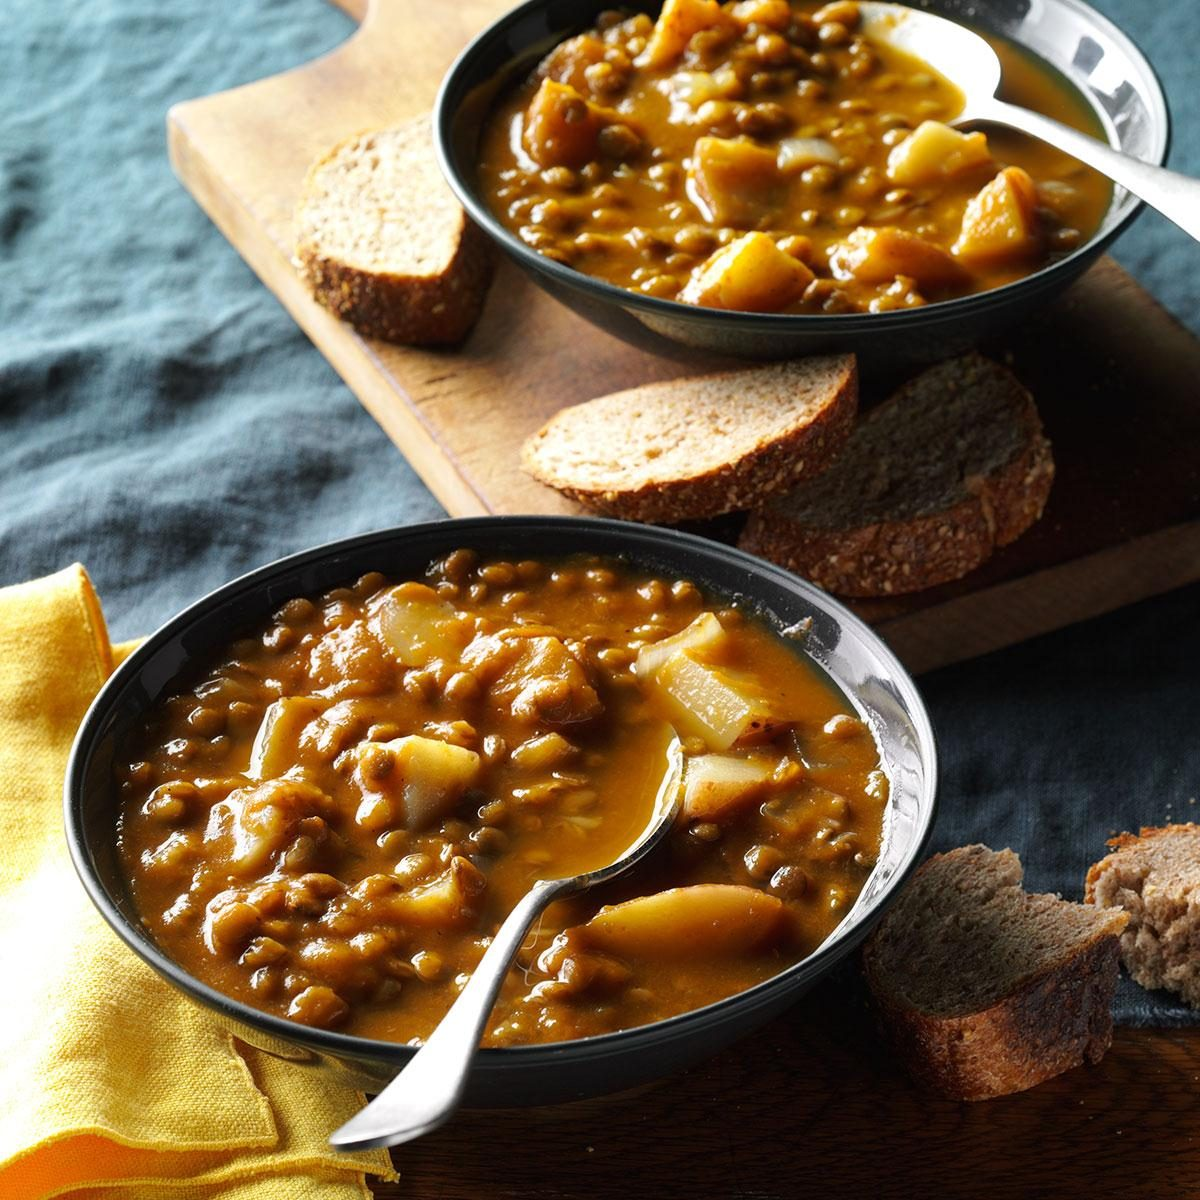 11 Heartwarming Pumpkin Soup Recipes for Fall